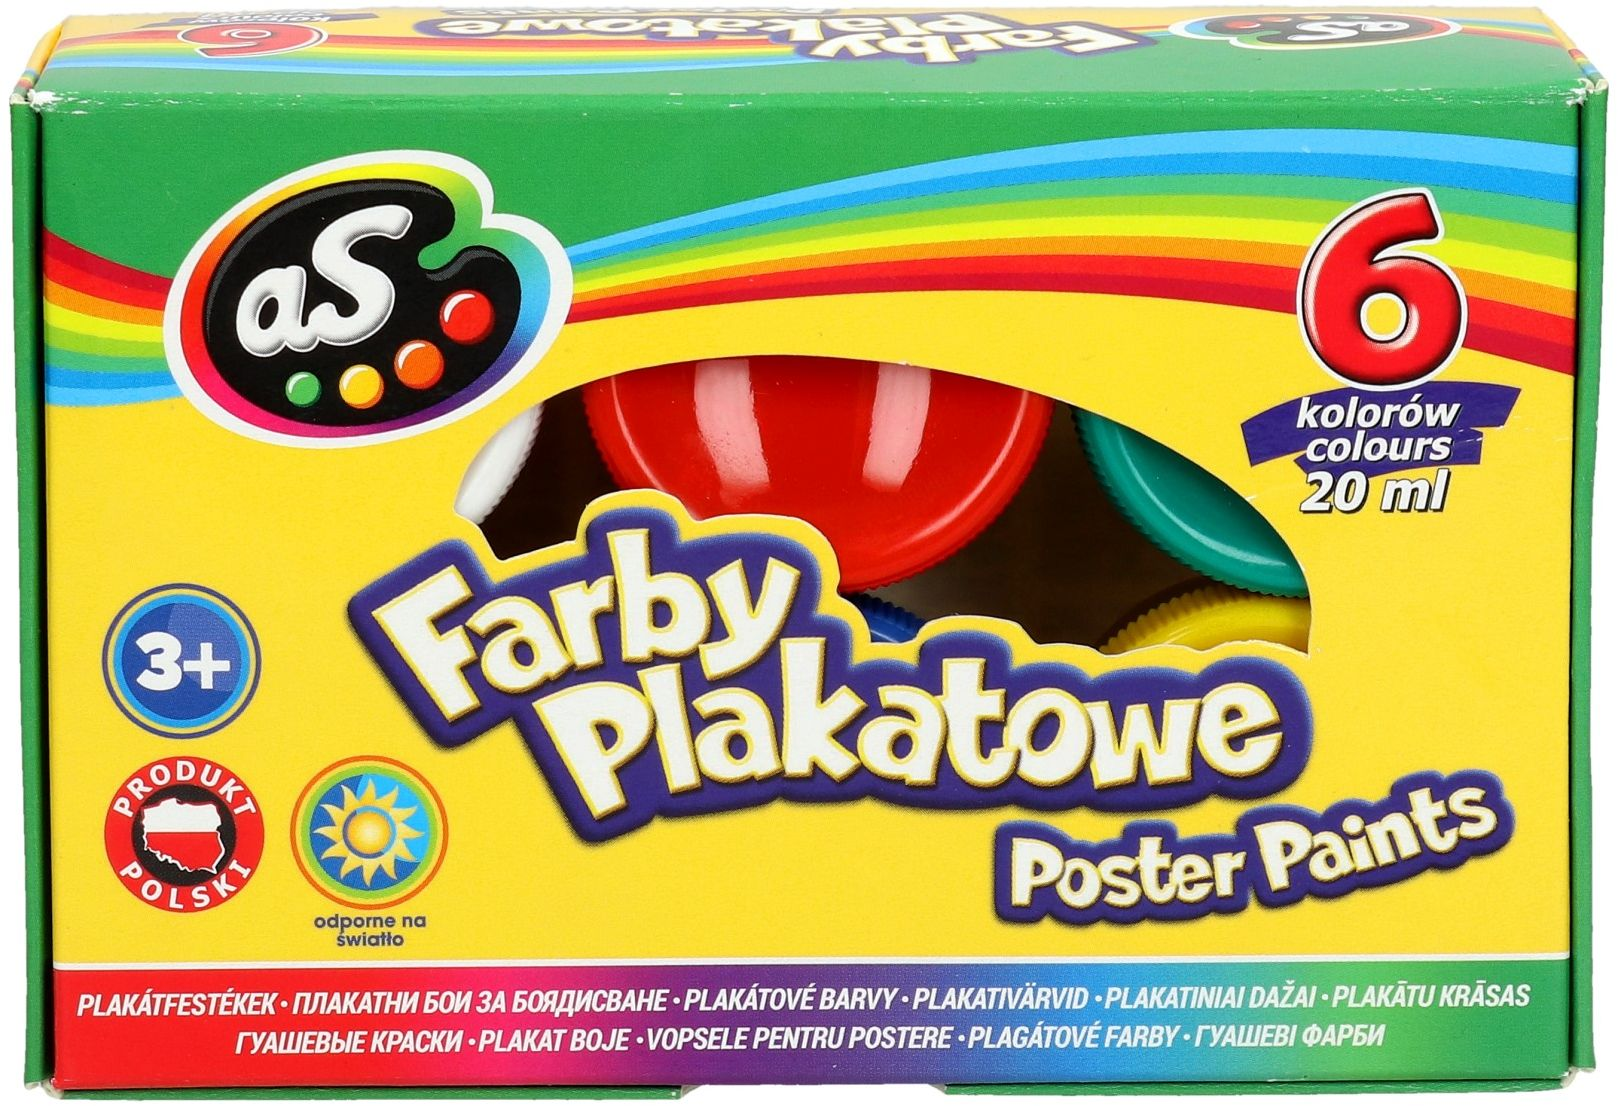 Farby plakatowe 6kol 20ml As 301219001